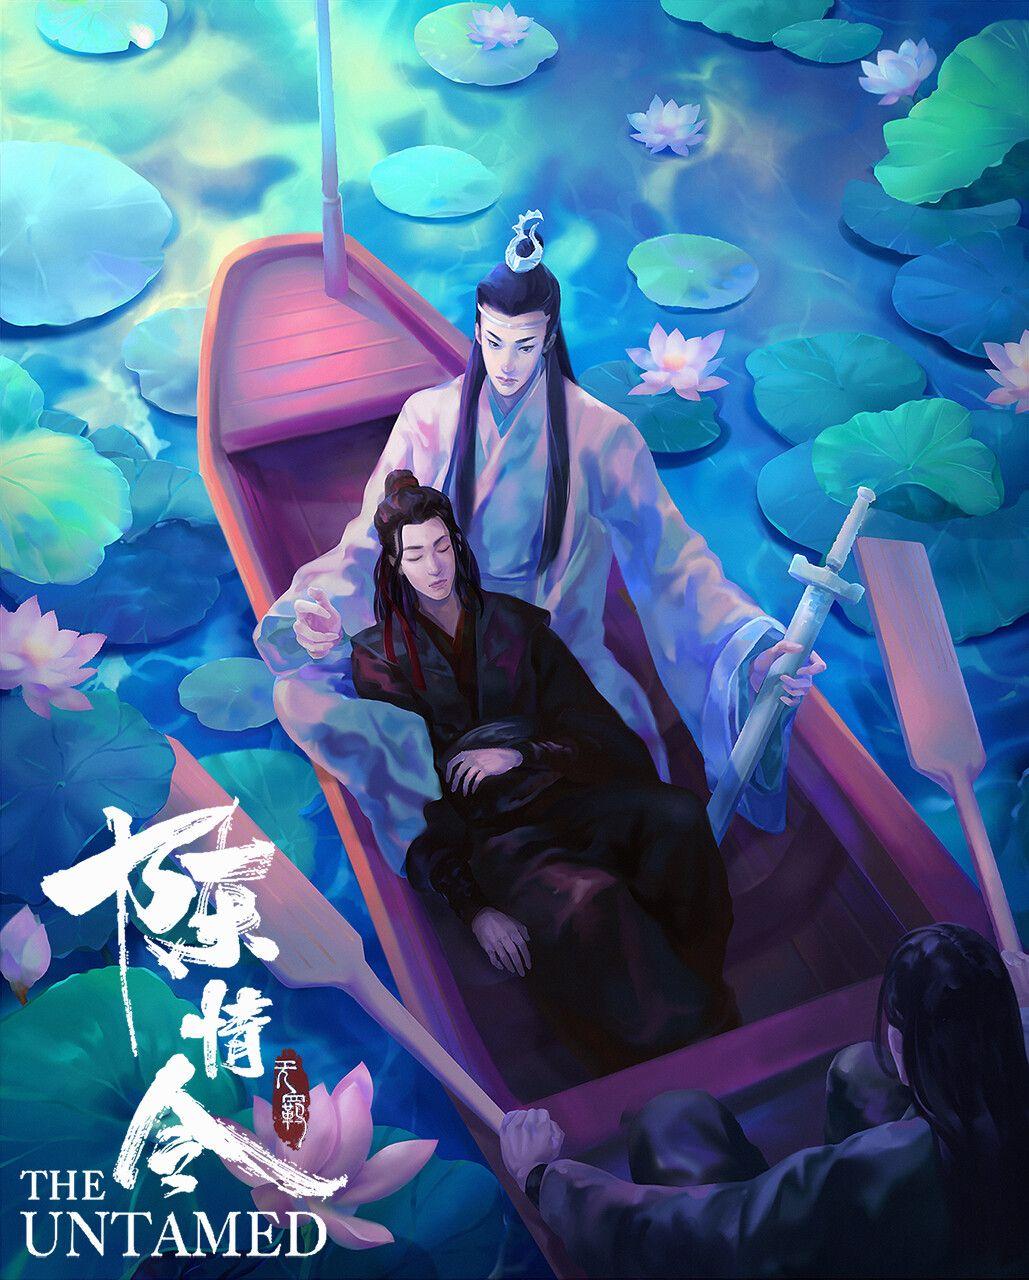 The Untamed Fanart Cute Cartoon Wallpapers Anime Cartoon Wallpaper